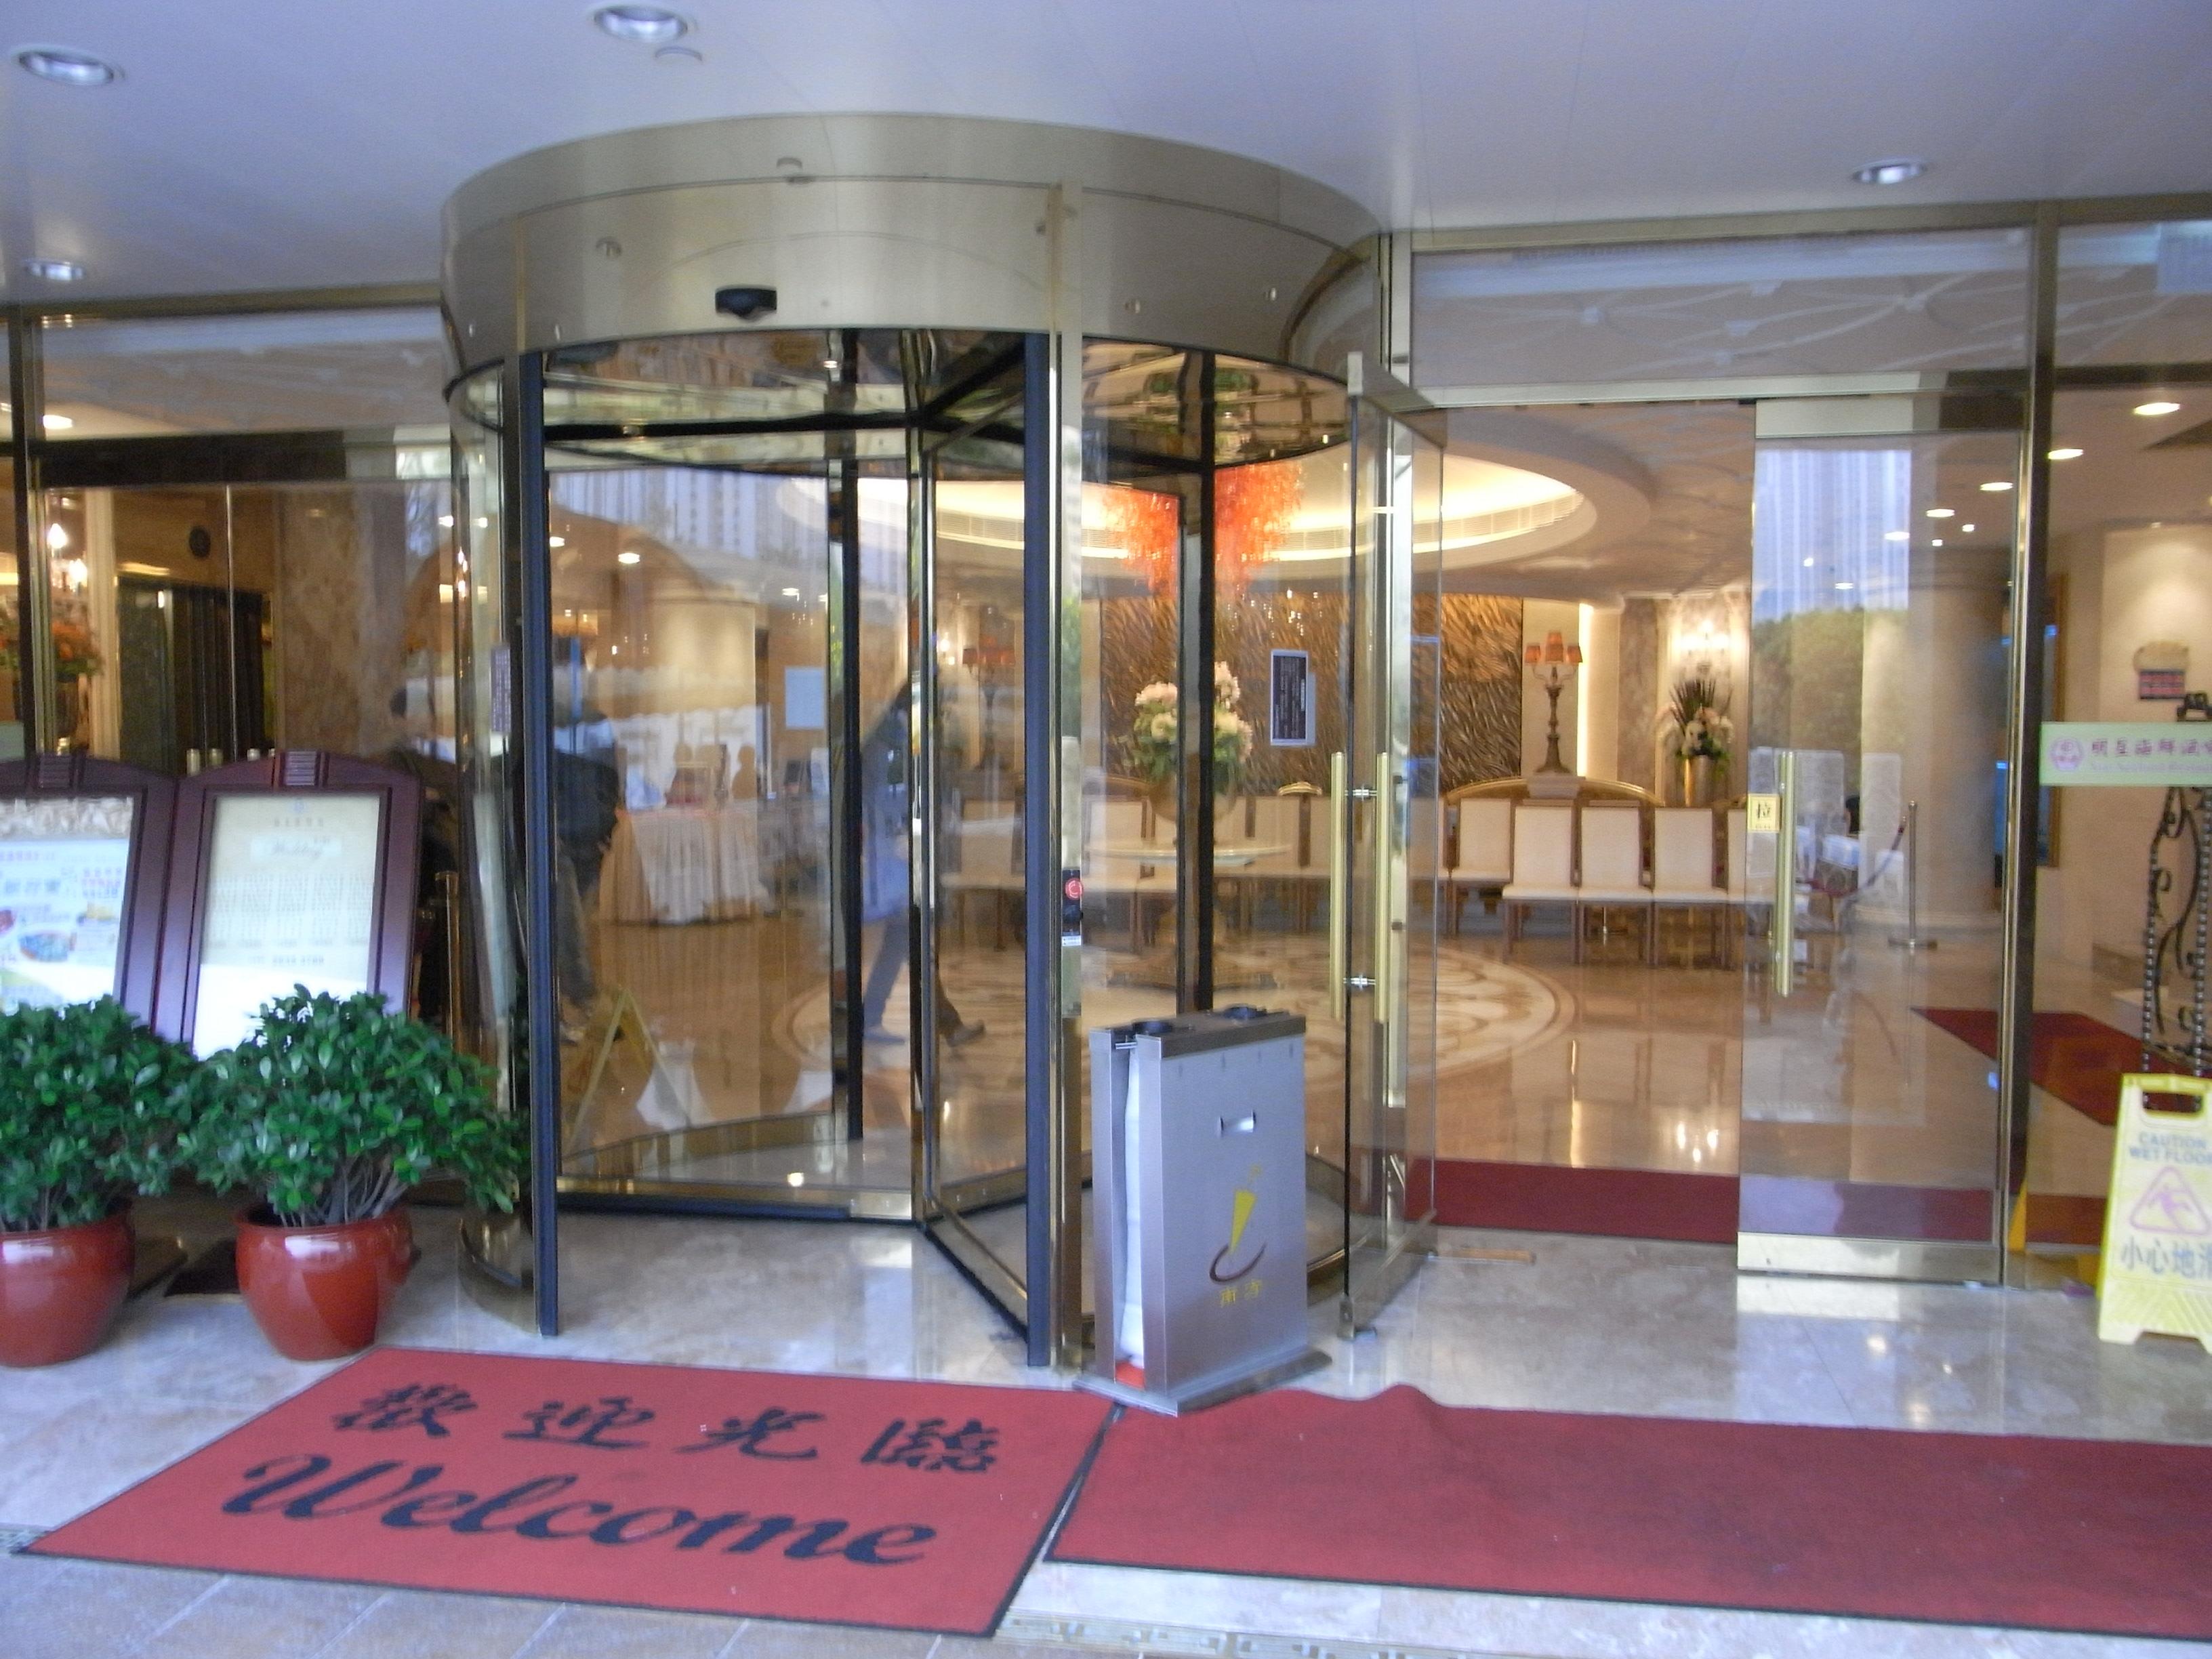 File:HK Shatin 沙田明星畫舫 Star Seafood Floating Restaurant Revolving doors Welcome carpet. & File:HK Shatin 沙田明星畫舫 Star Seafood Floating Restaurant ... Pezcame.Com